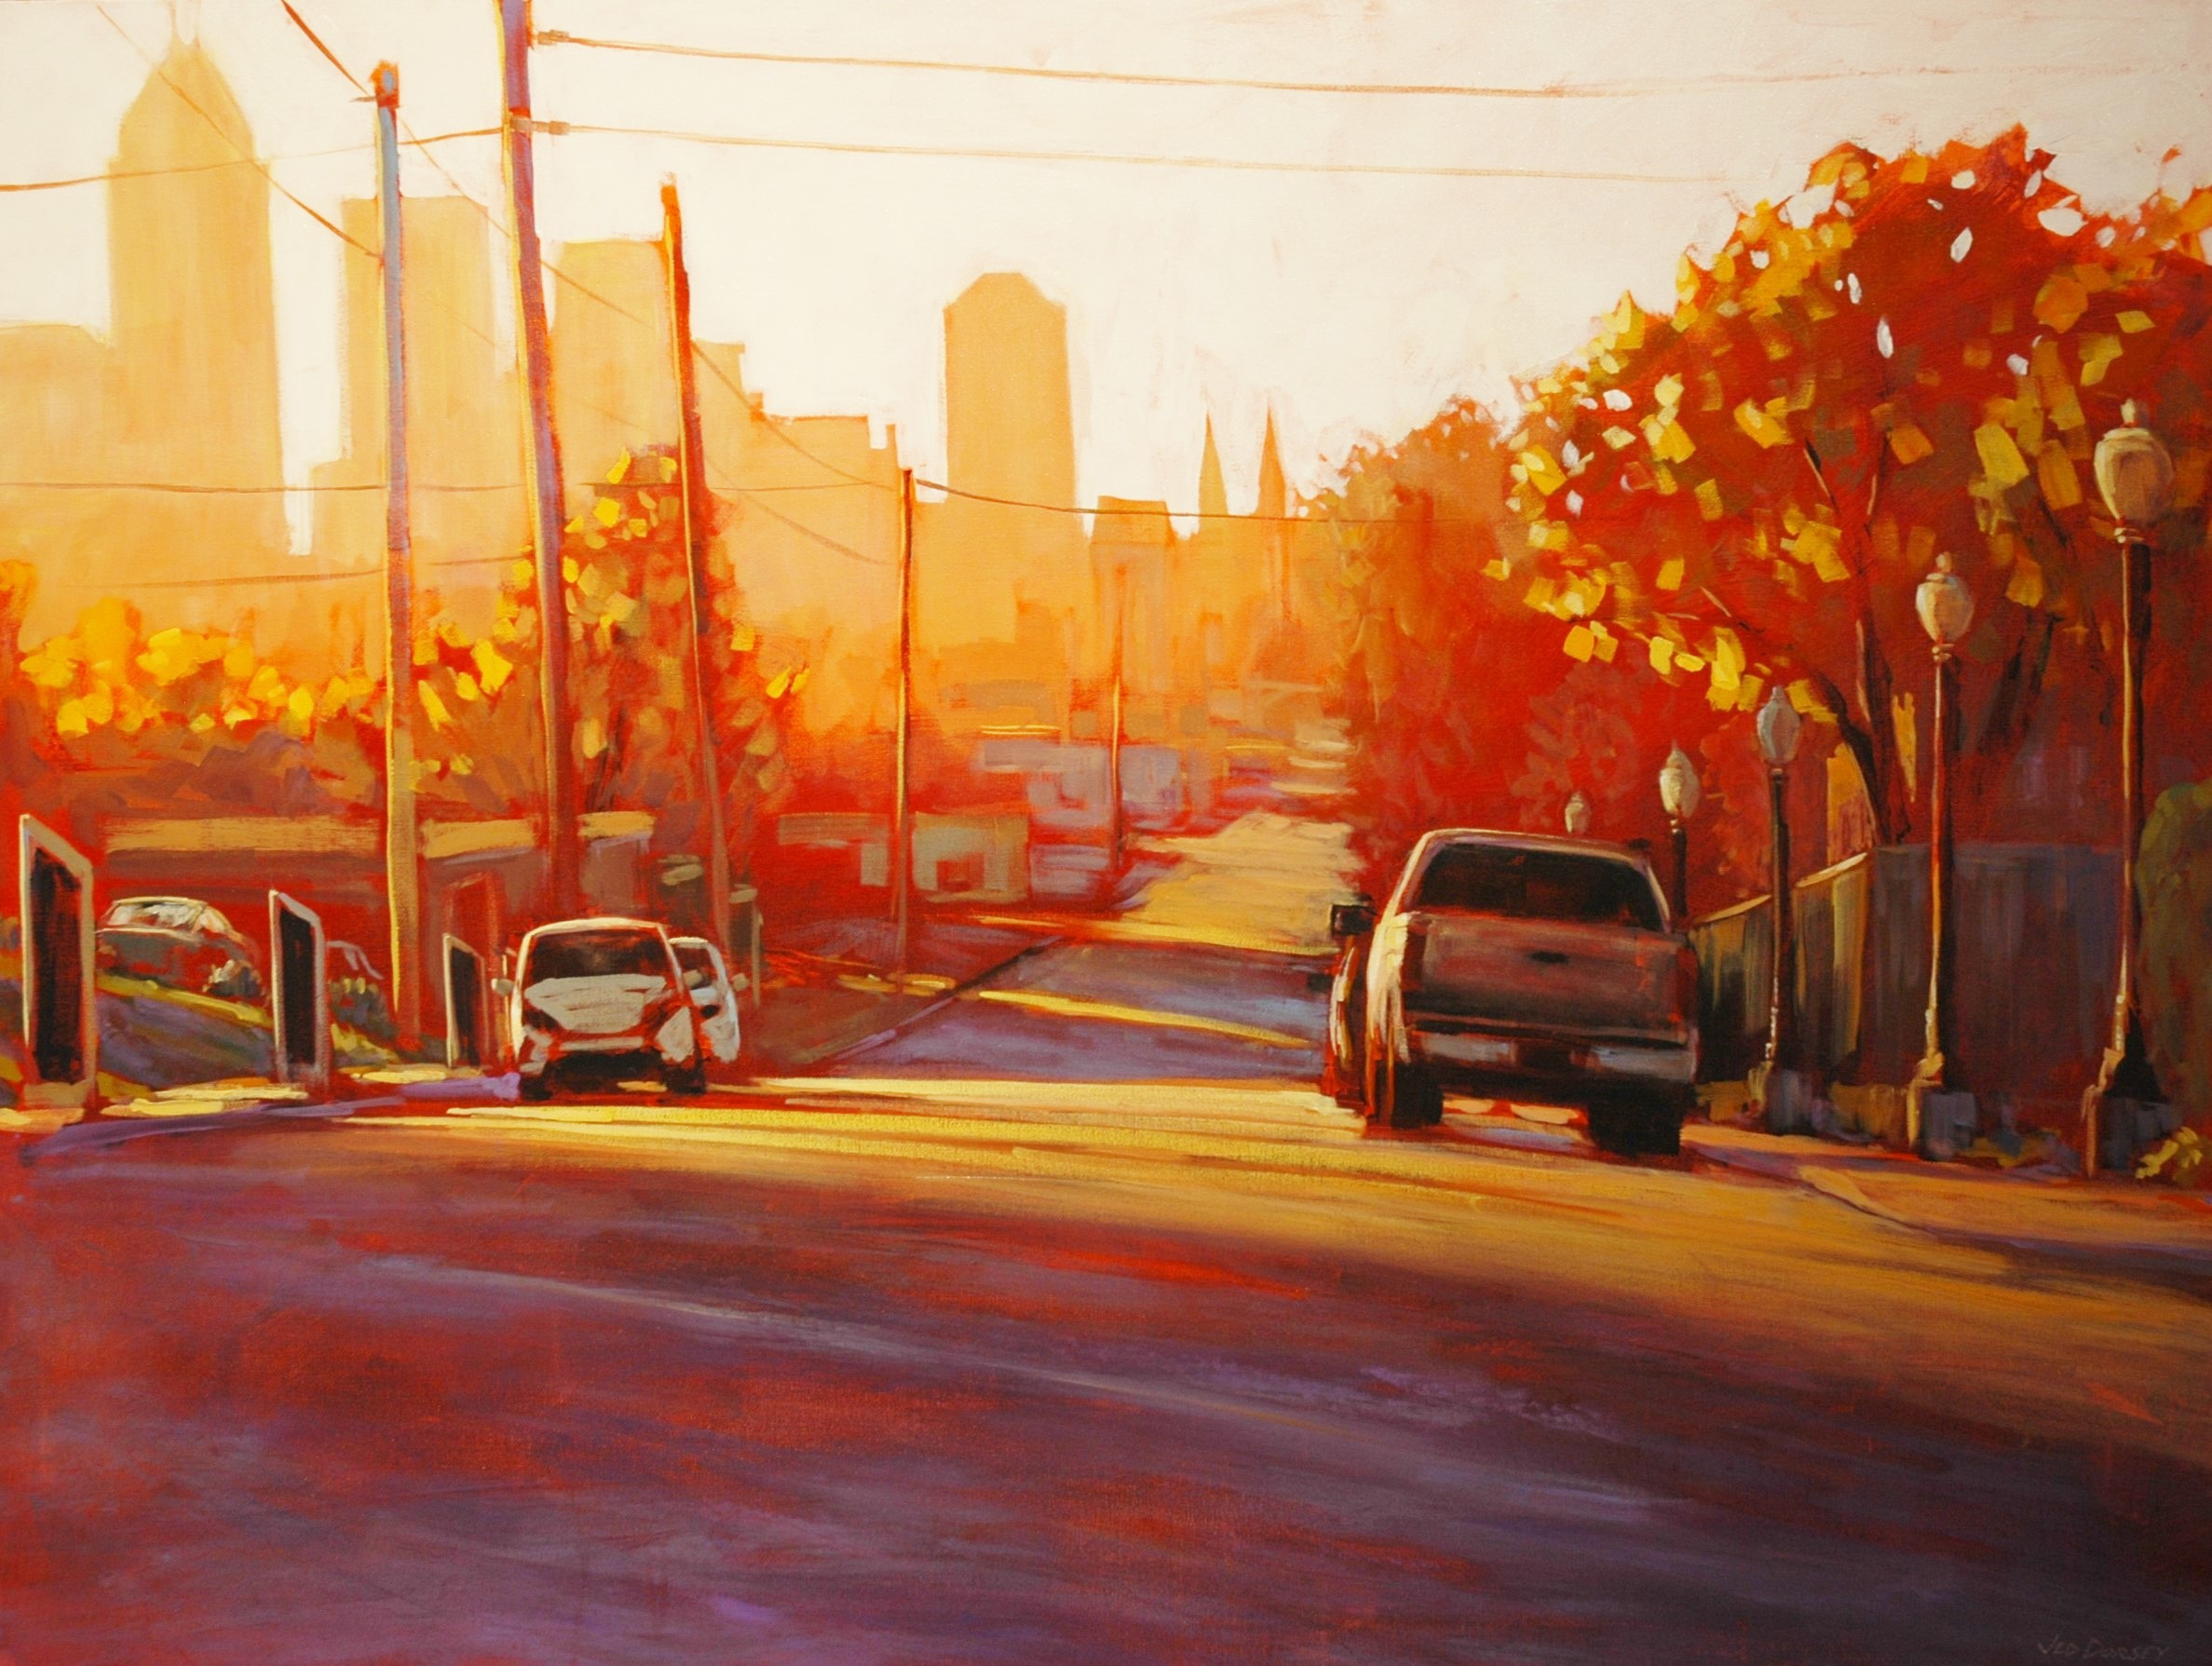 20 - HCA 2016 - Our City - 36x48